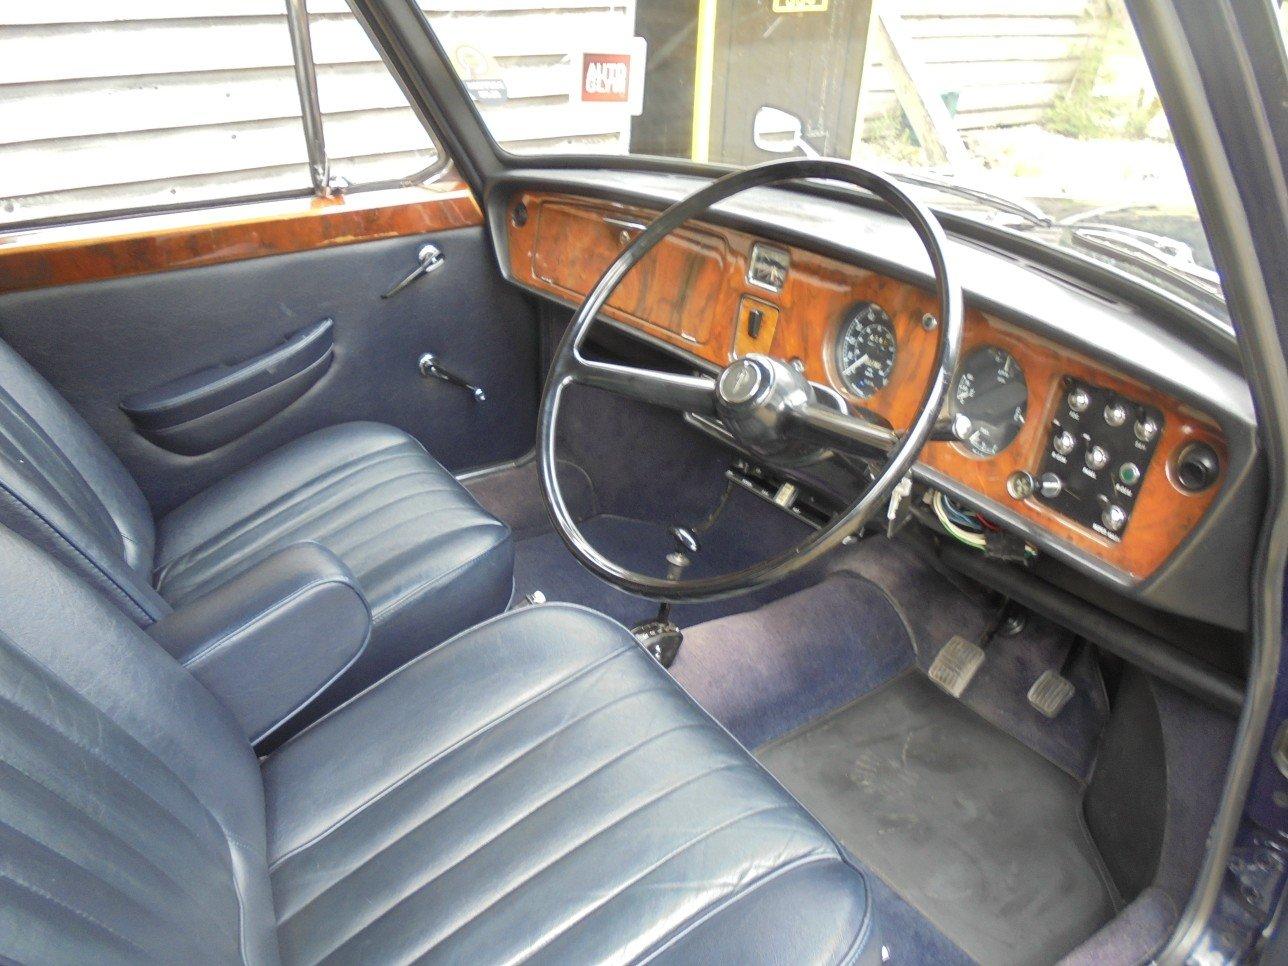 1973 Austin Princess Vanden Plas 1300 MK 111 Automatic 4 Door. For Sale (picture 5 of 6)